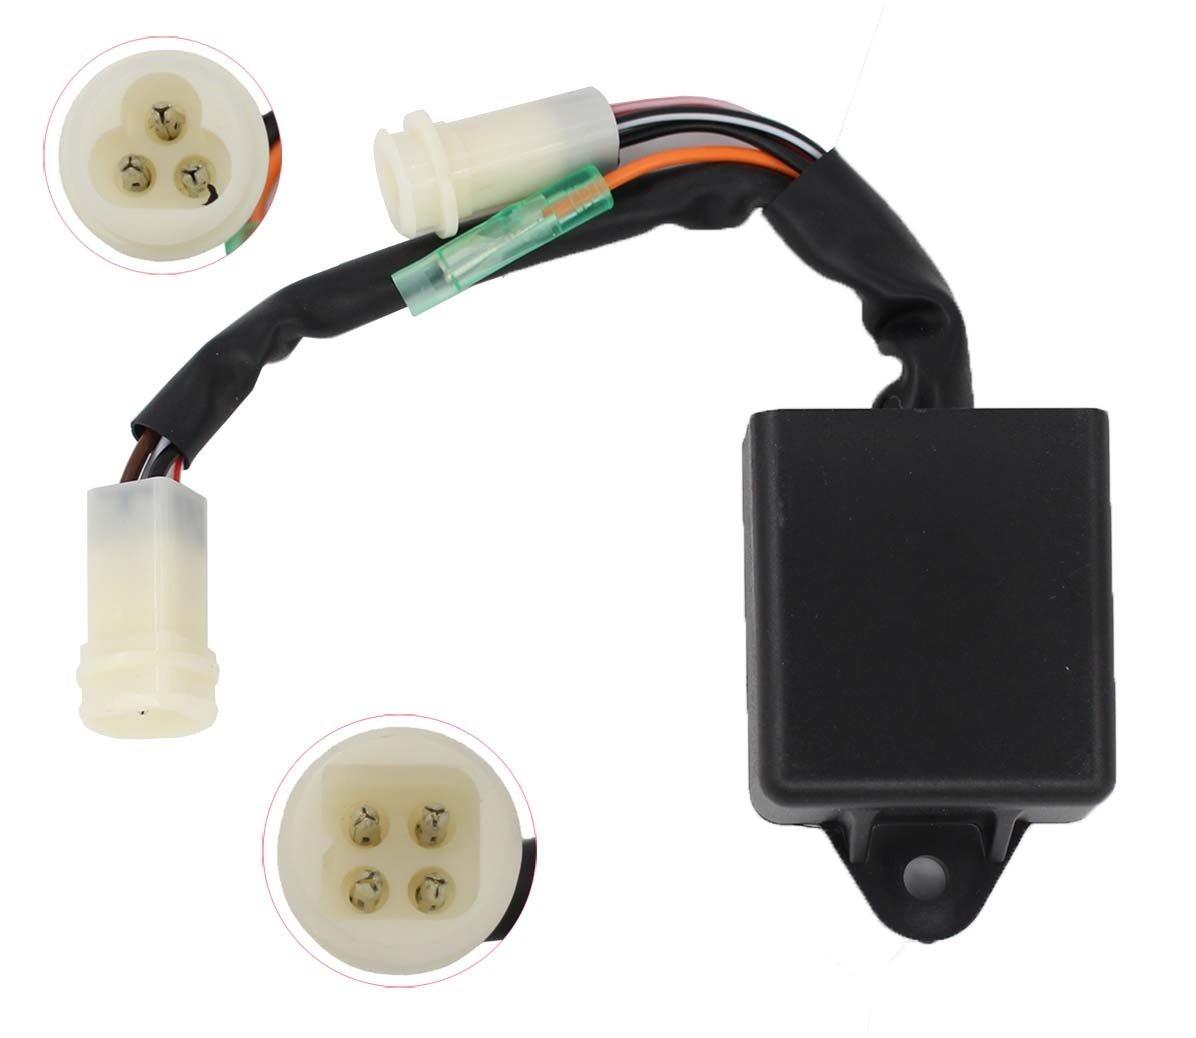 CDI Box Unit Module For Yamaha Yamaha YFM 225 86 88 YFM 250 Moto 4 89 90 91 225 Replace # 59V-85540-20-00 59V-85540-21-00 59Y-85540-21-00